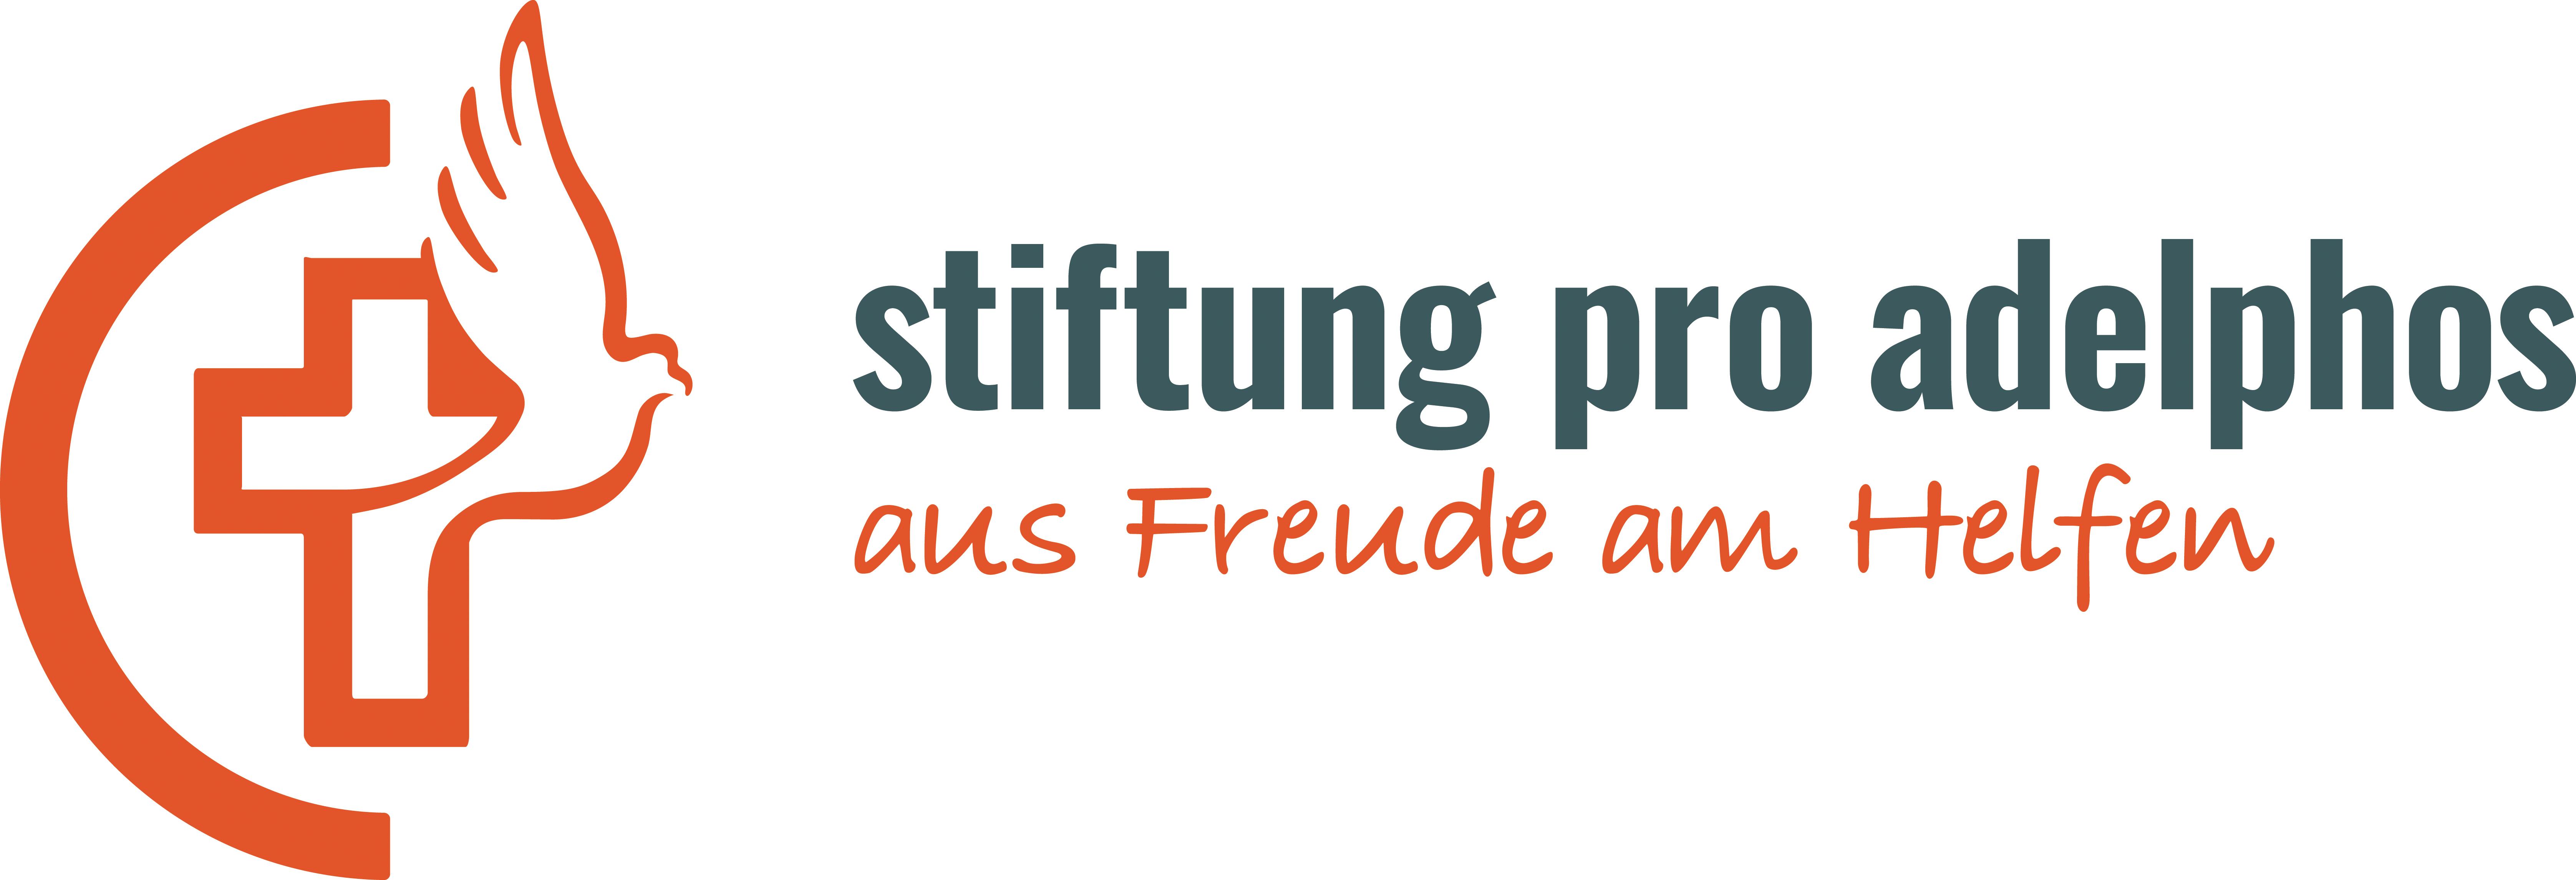 Stiftung Pro Adelphos